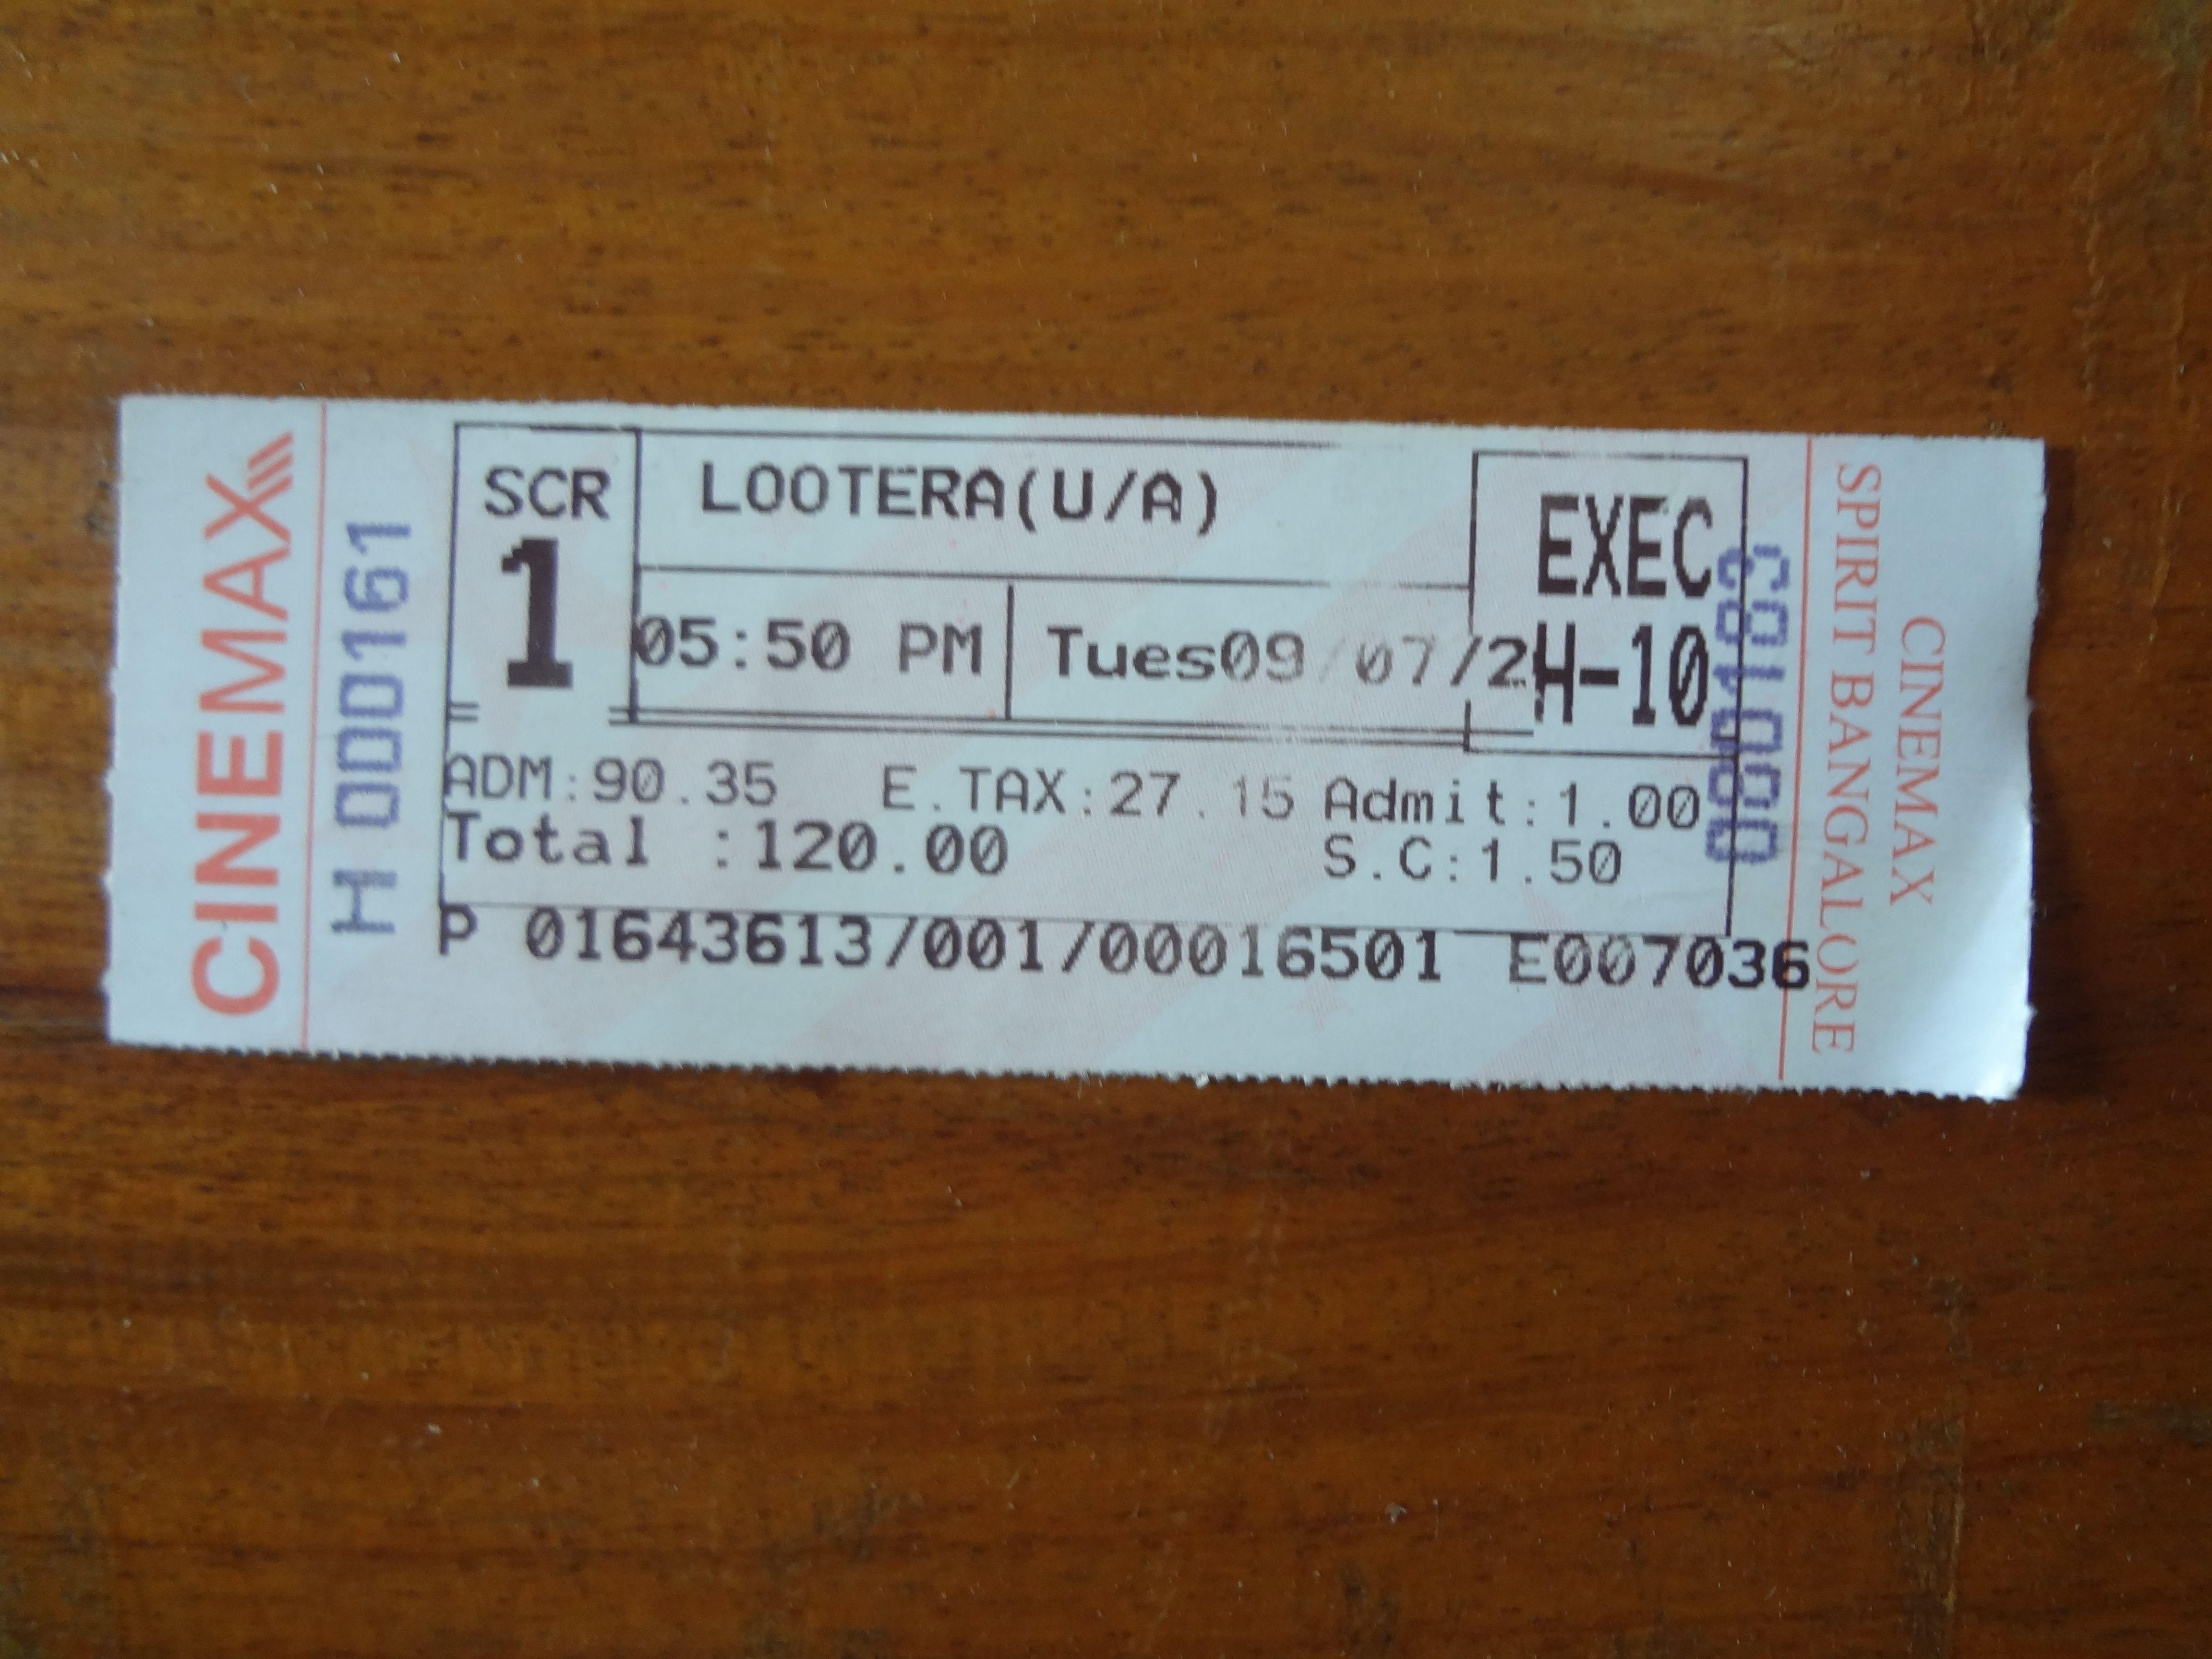 Movie ticket of Lootera (Hindi Movie) at CineMAX, Bangalore